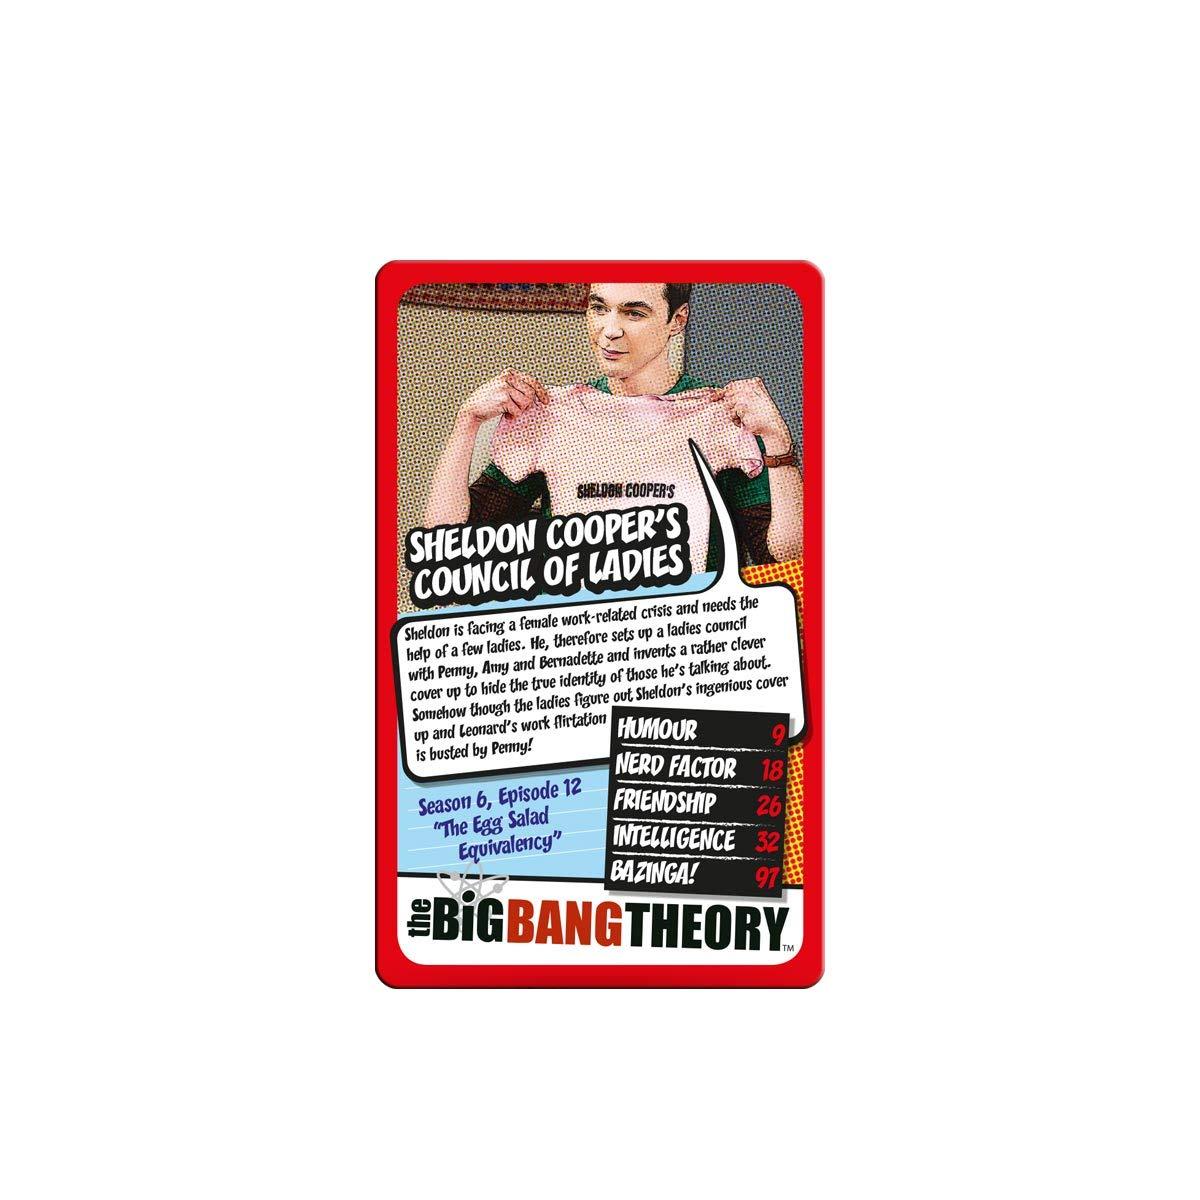 Big Bang Theory Top Trumps Card Game Toys Games Rockpaperscissorslizardspock Geek Pinterest